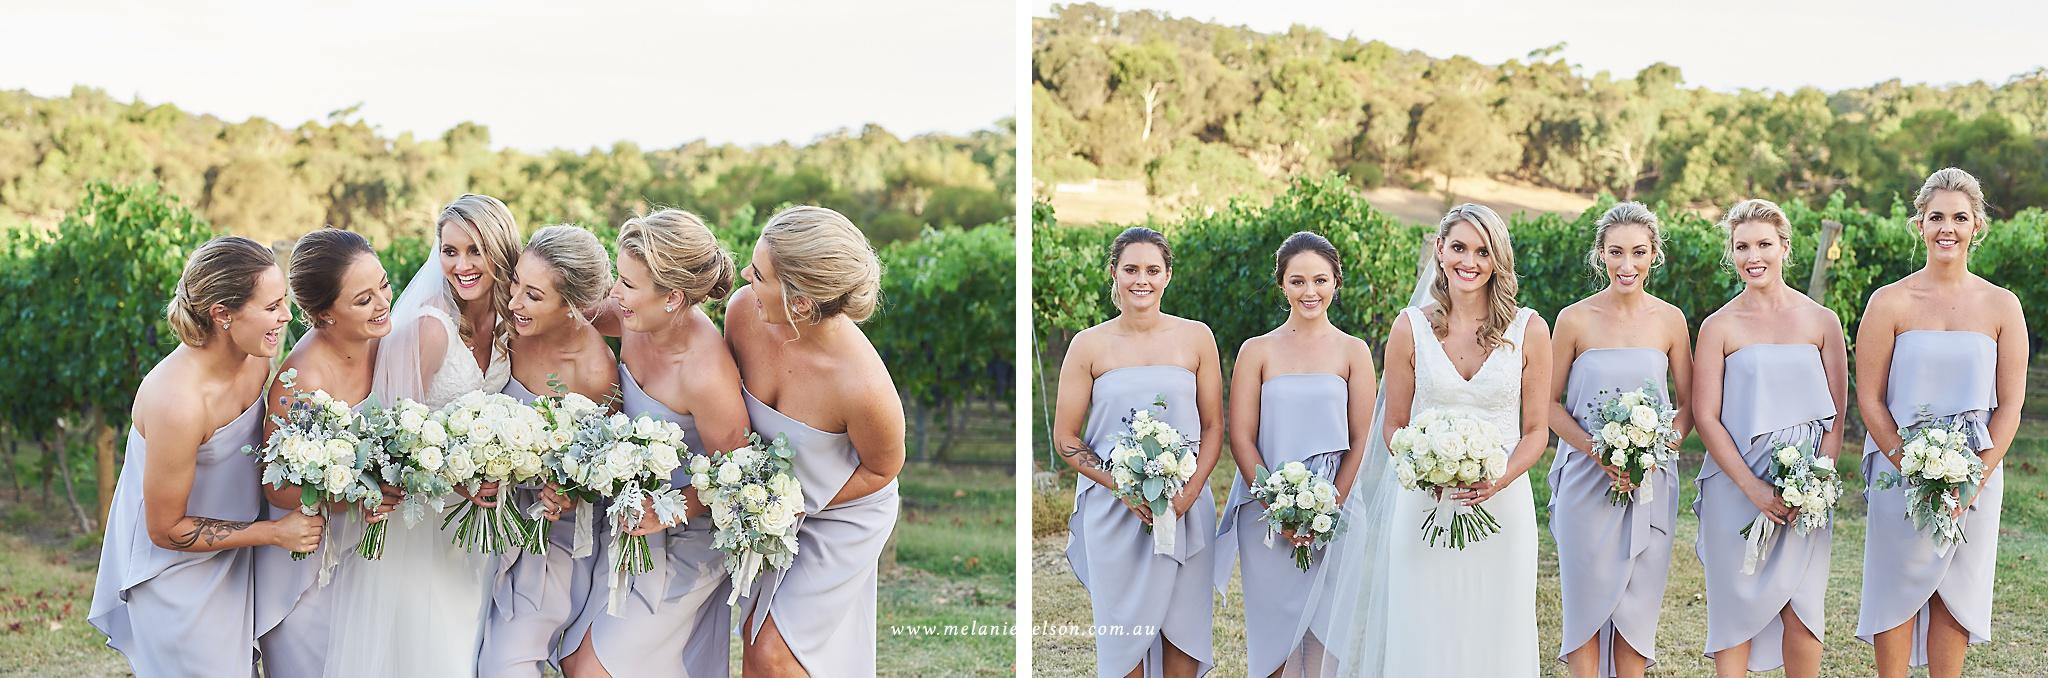 longview_vineyard_wedding_0067.jpg